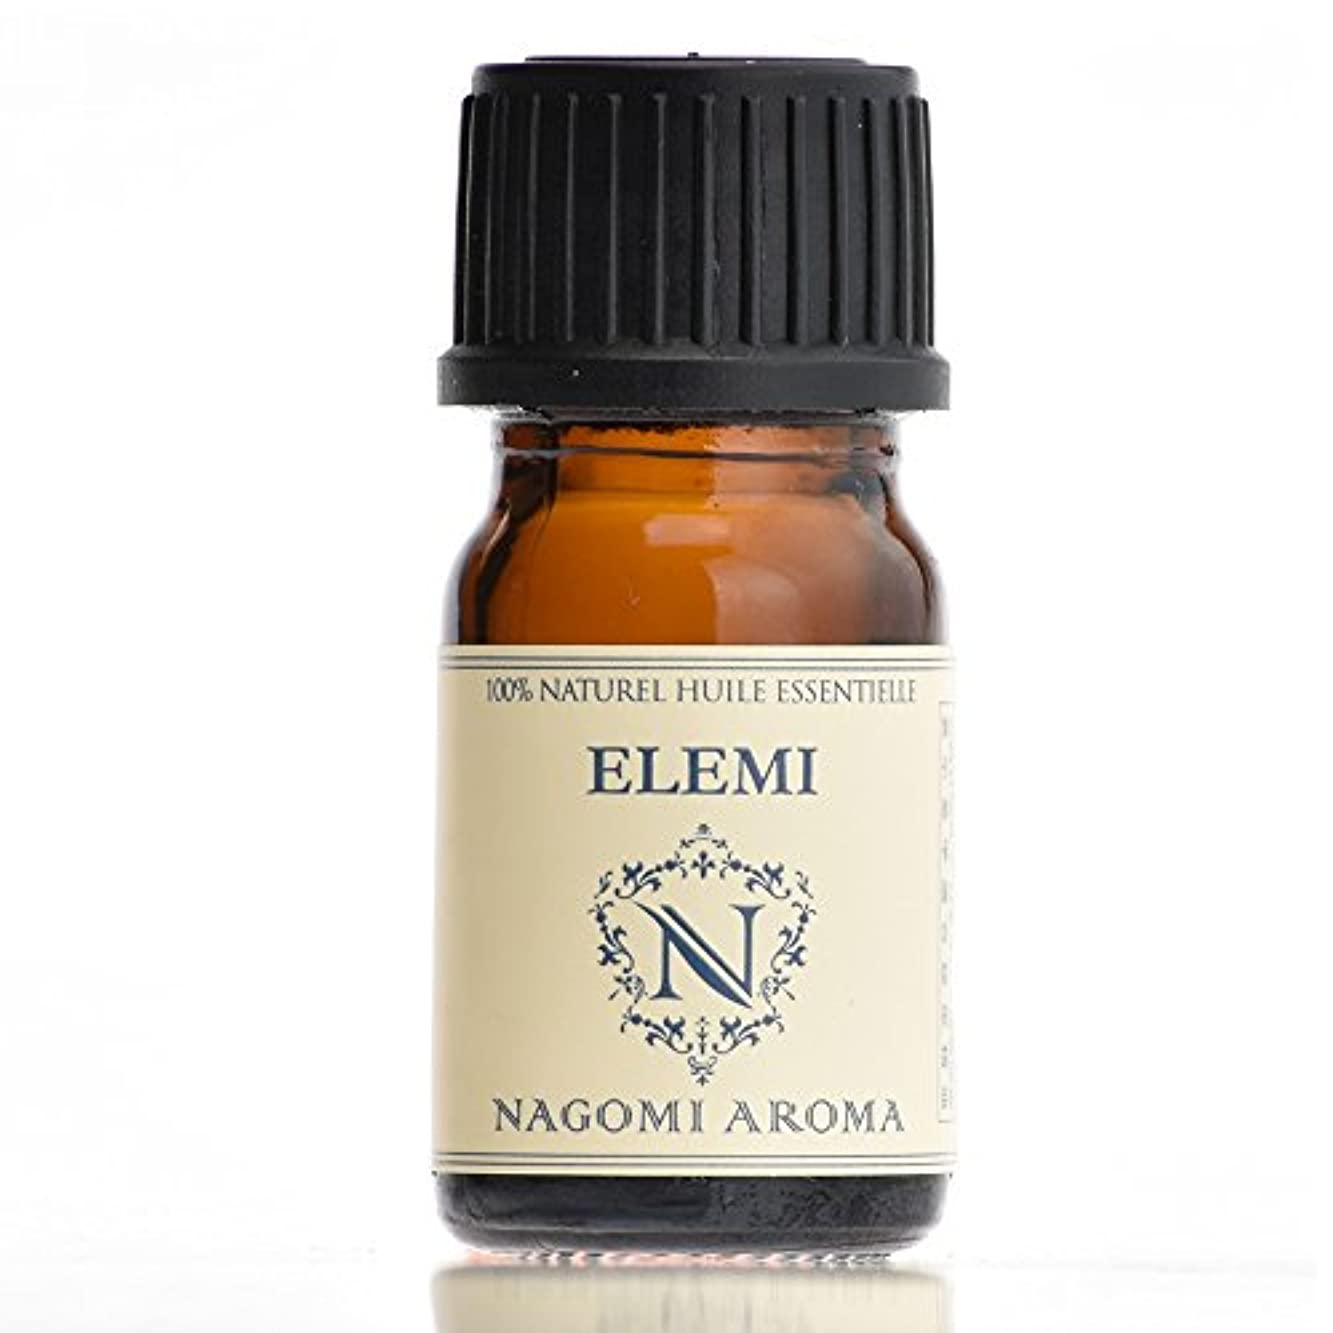 【AEAJ認定表示基準認定精油】NAGOMI PURE エレミ 5ml 【エッセンシャルオイル】【精油】【アロマオイル】|CONVOILs